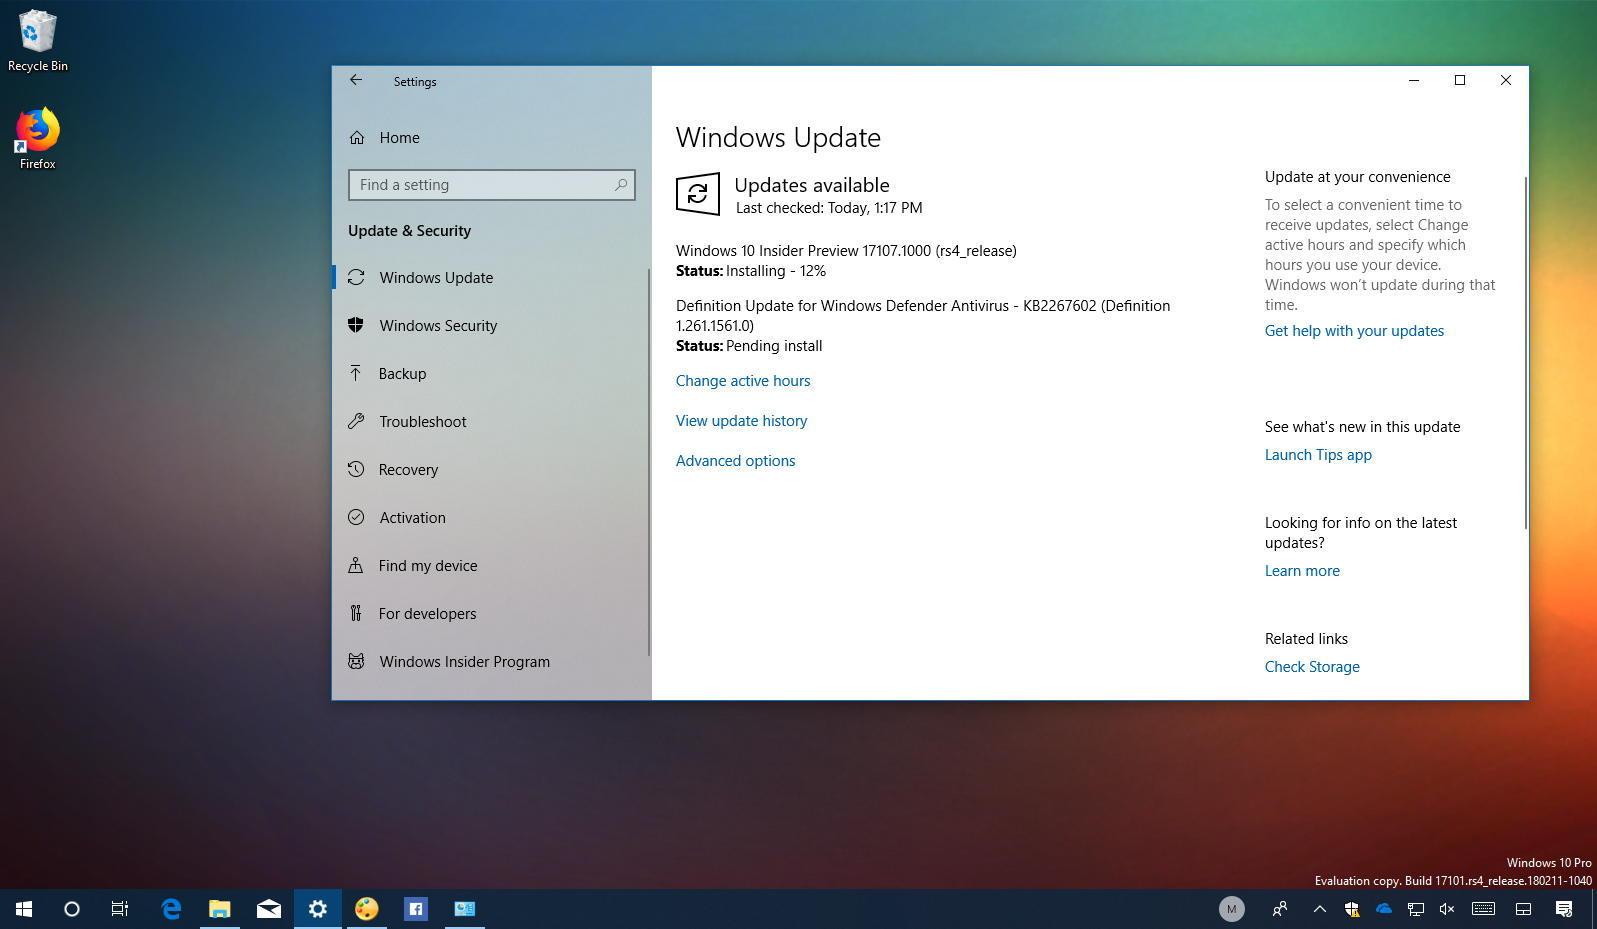 Windows 10 build 17107